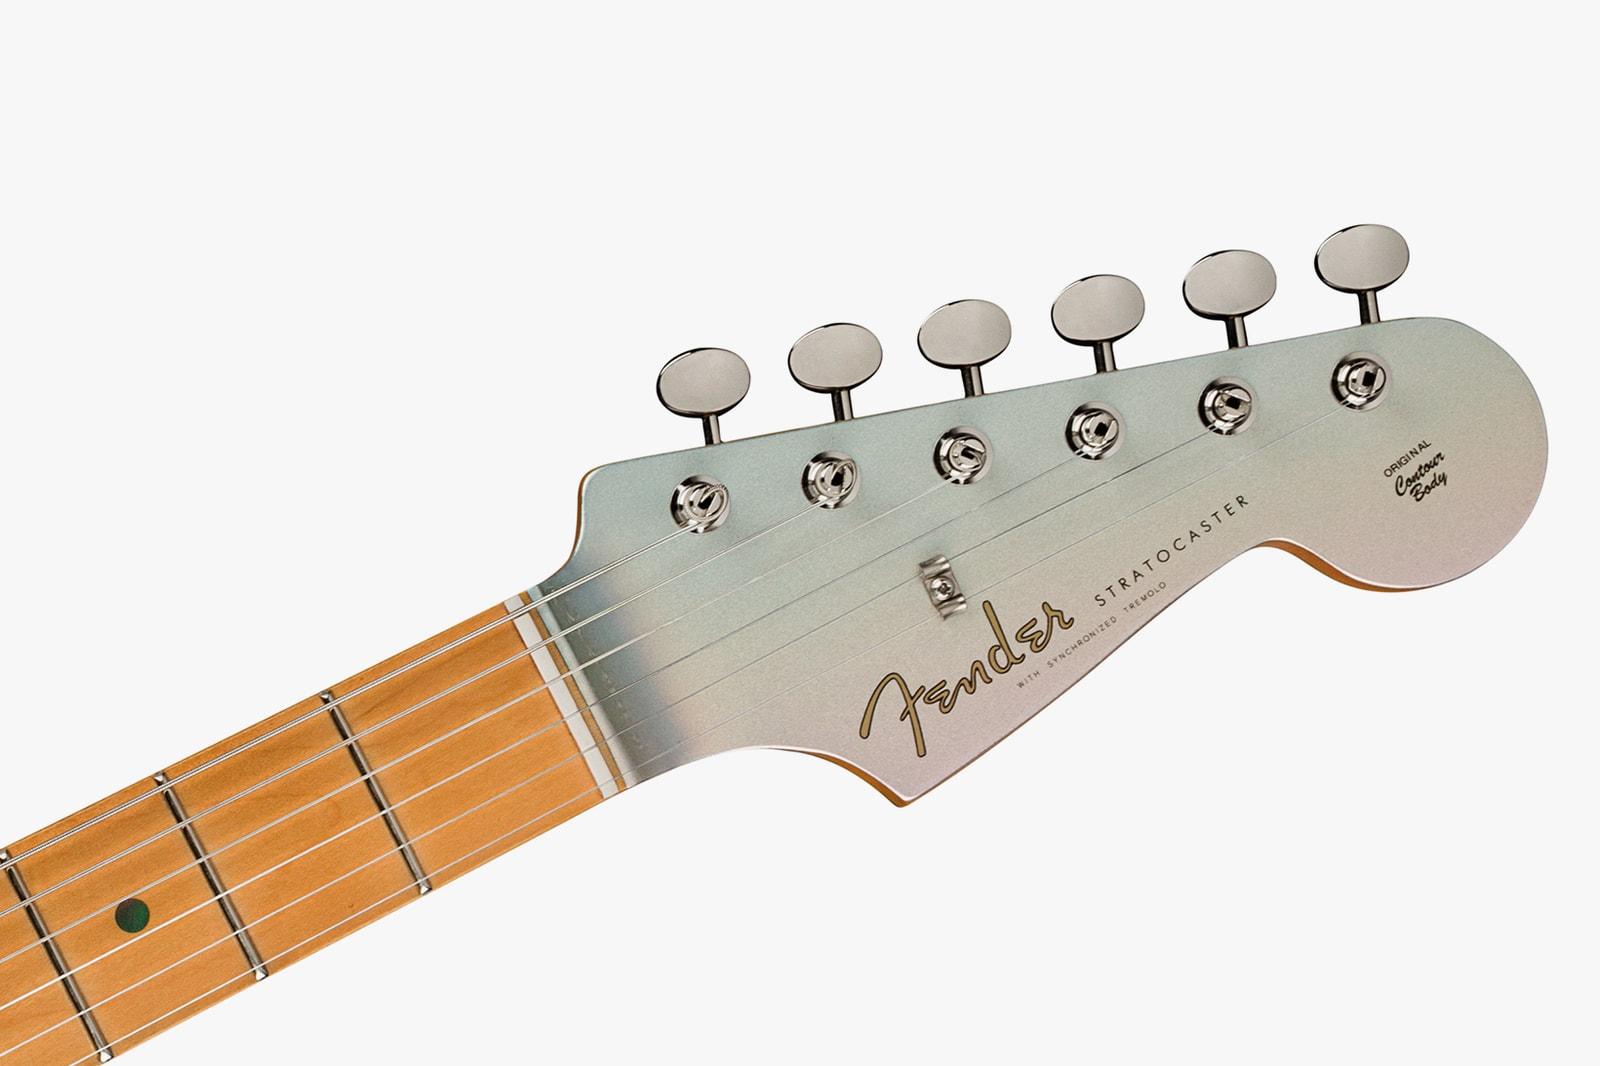 her gabriella wilson fender signature stratocaster guitar musician singer artist